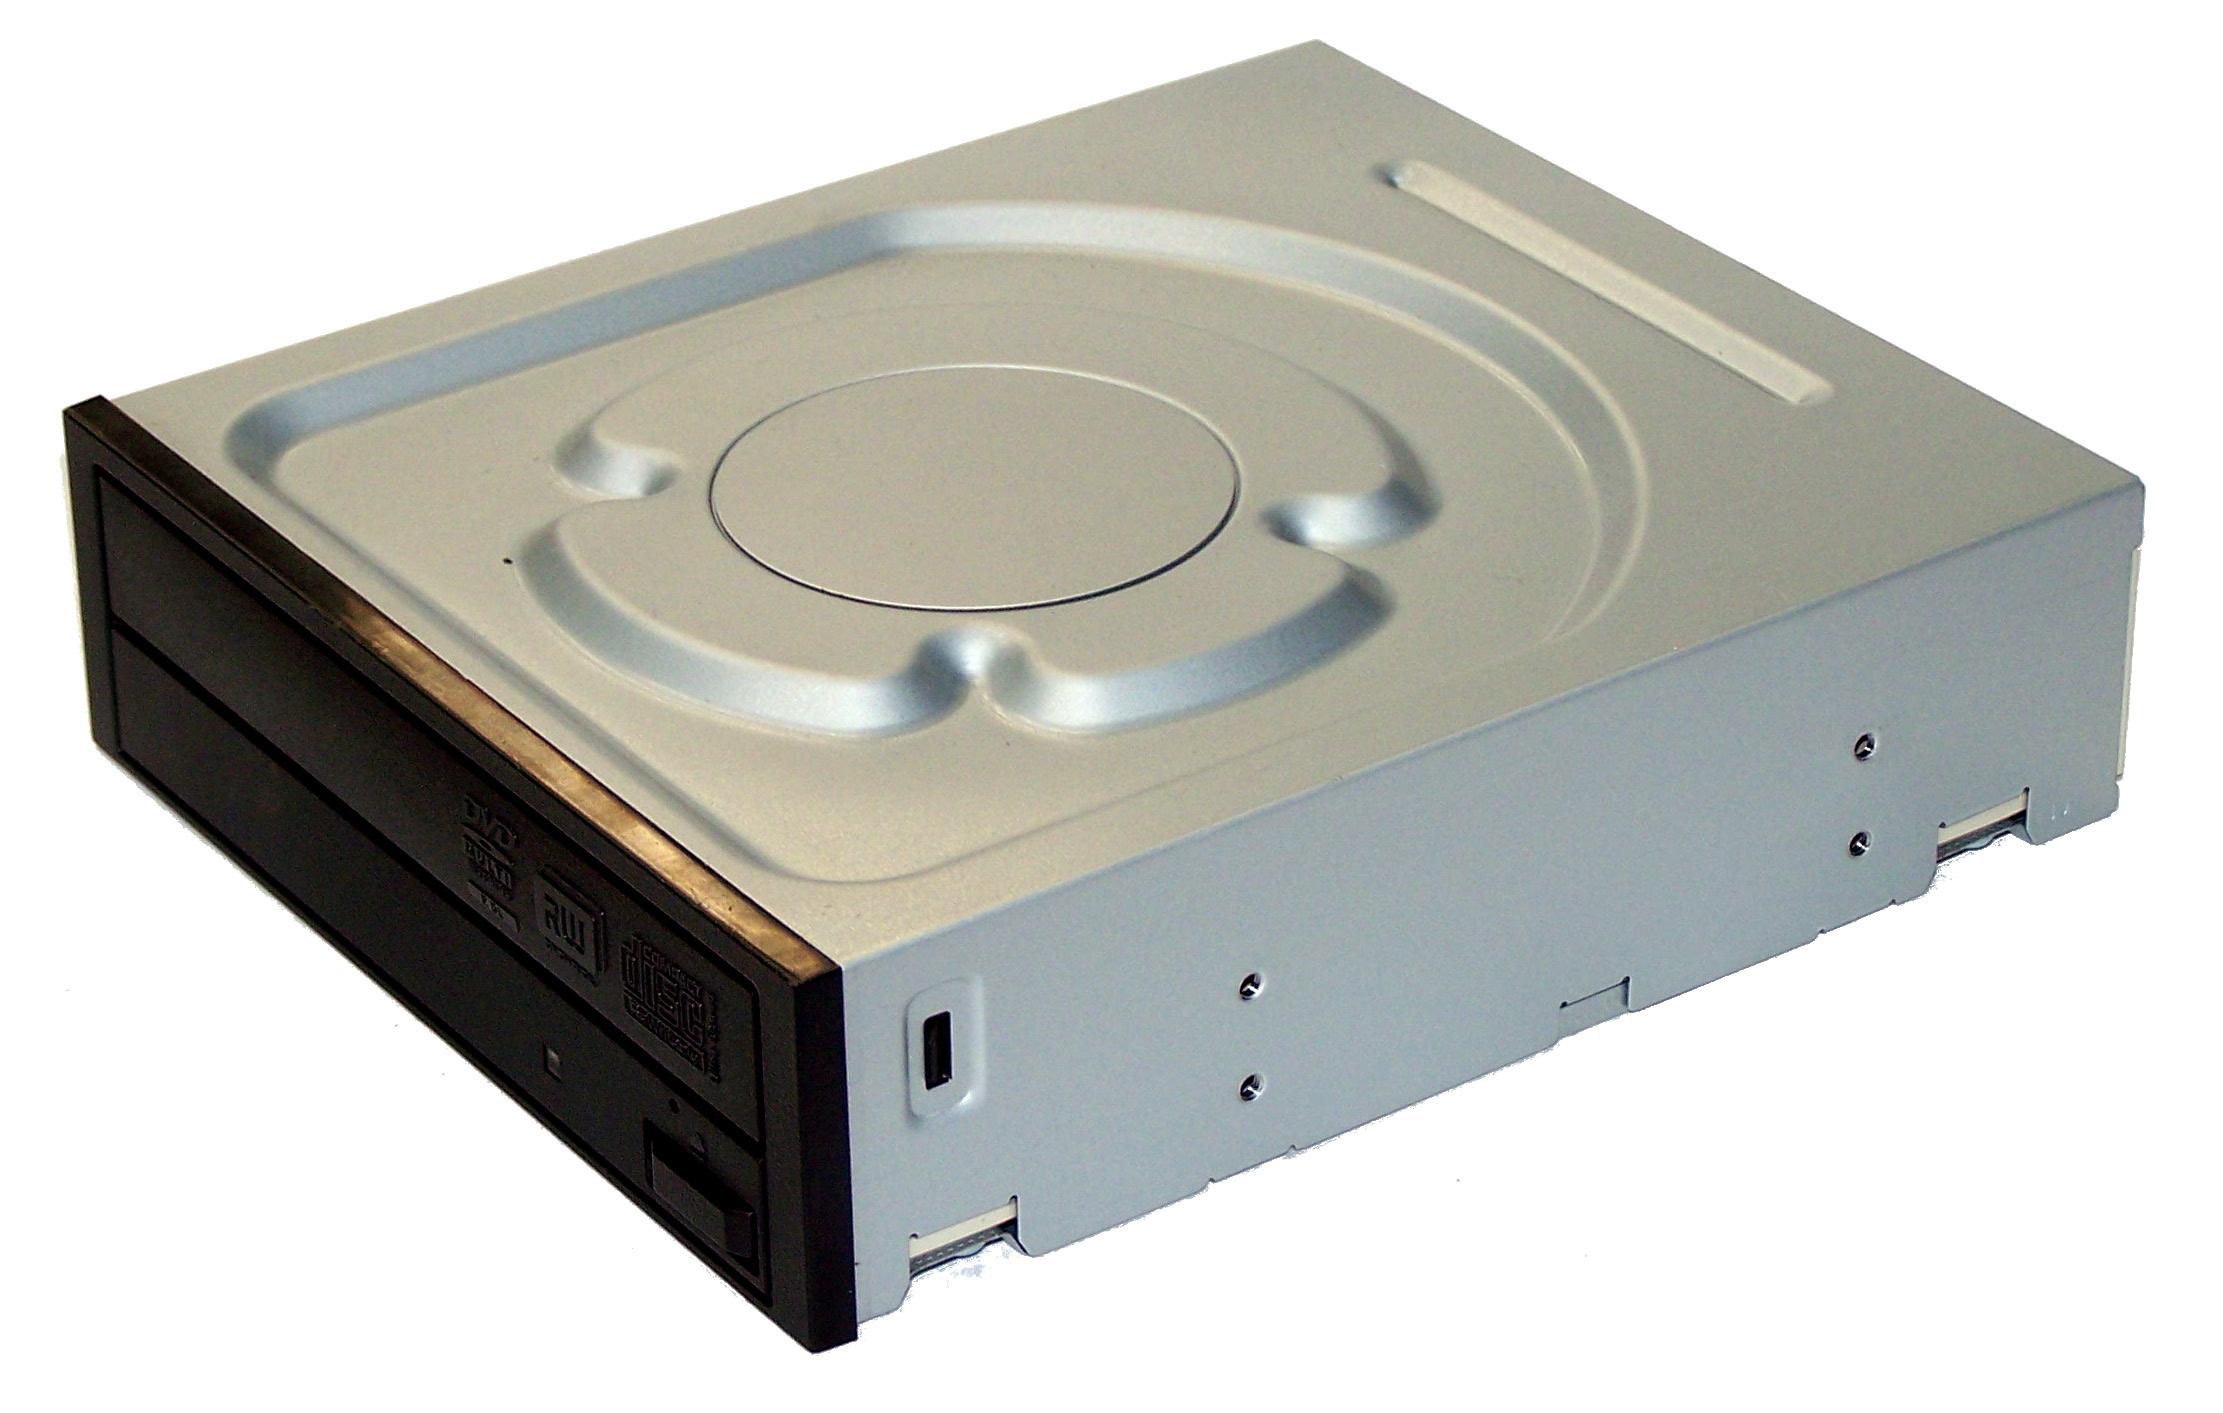 DOWNLOAD DRIVERS: OPTIARC DVD RW AD 7280S